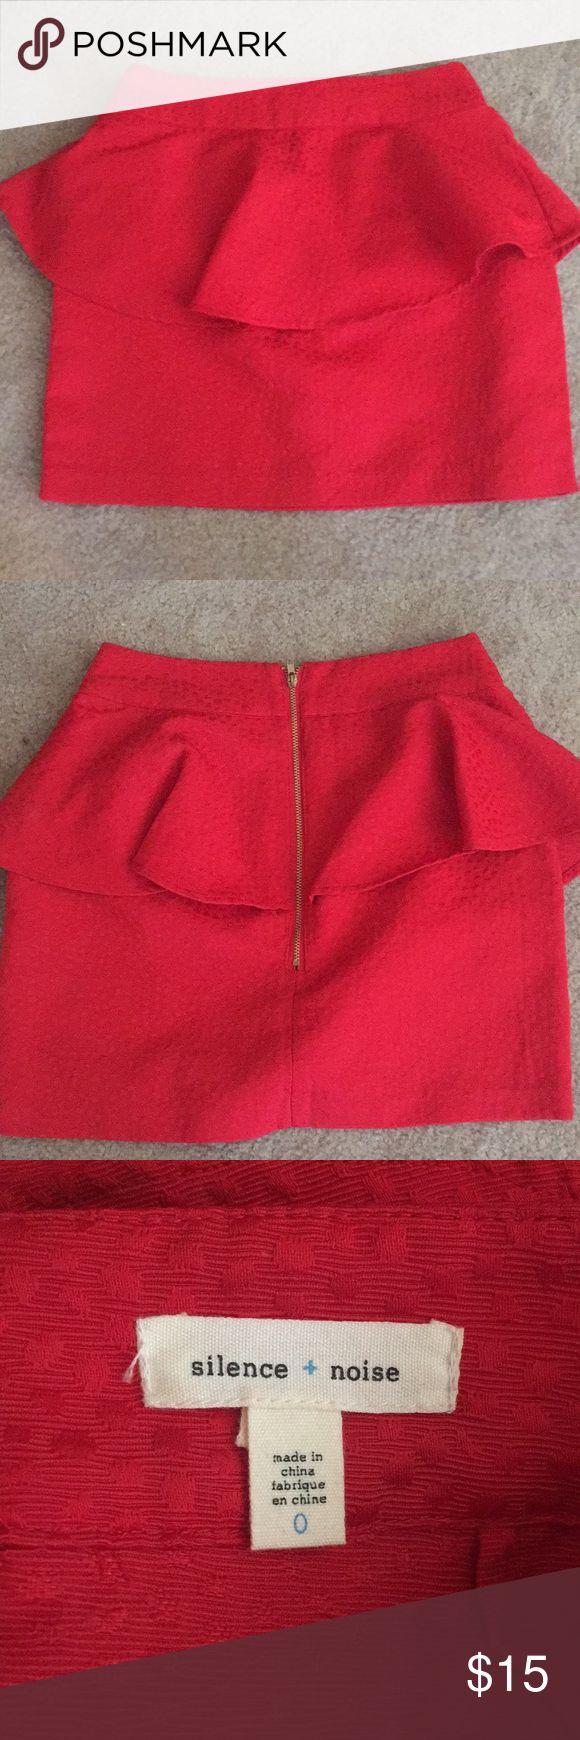 Silence and Noise mini peplum skirt Peplum skirt from urban outfitters silence + noise Skirts Mini